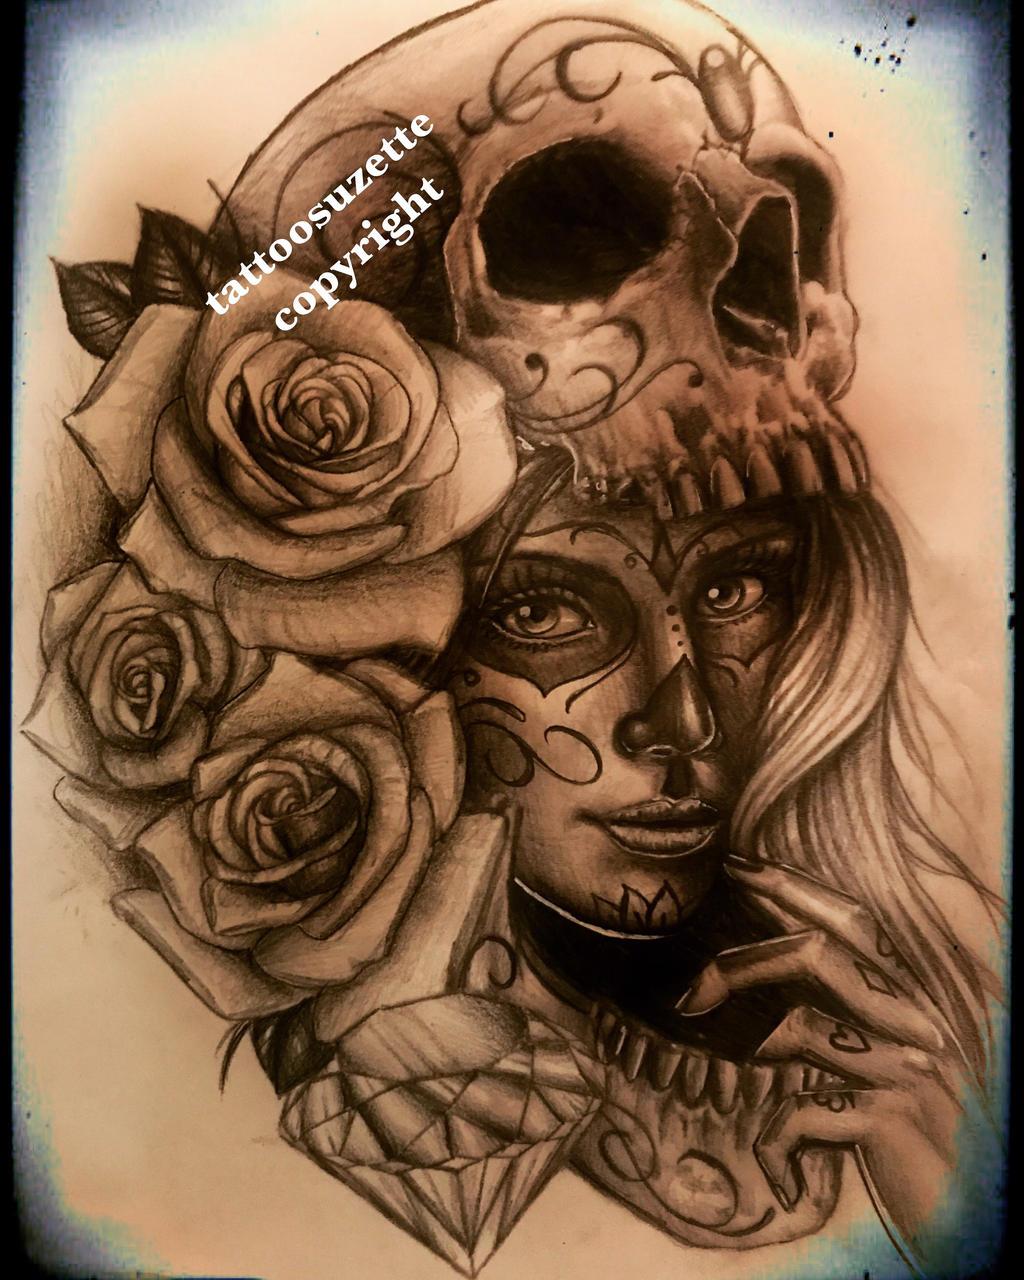 Tatouage catrina by tattoosuzette on deviantart - Les plus beaux tatouages femme ...